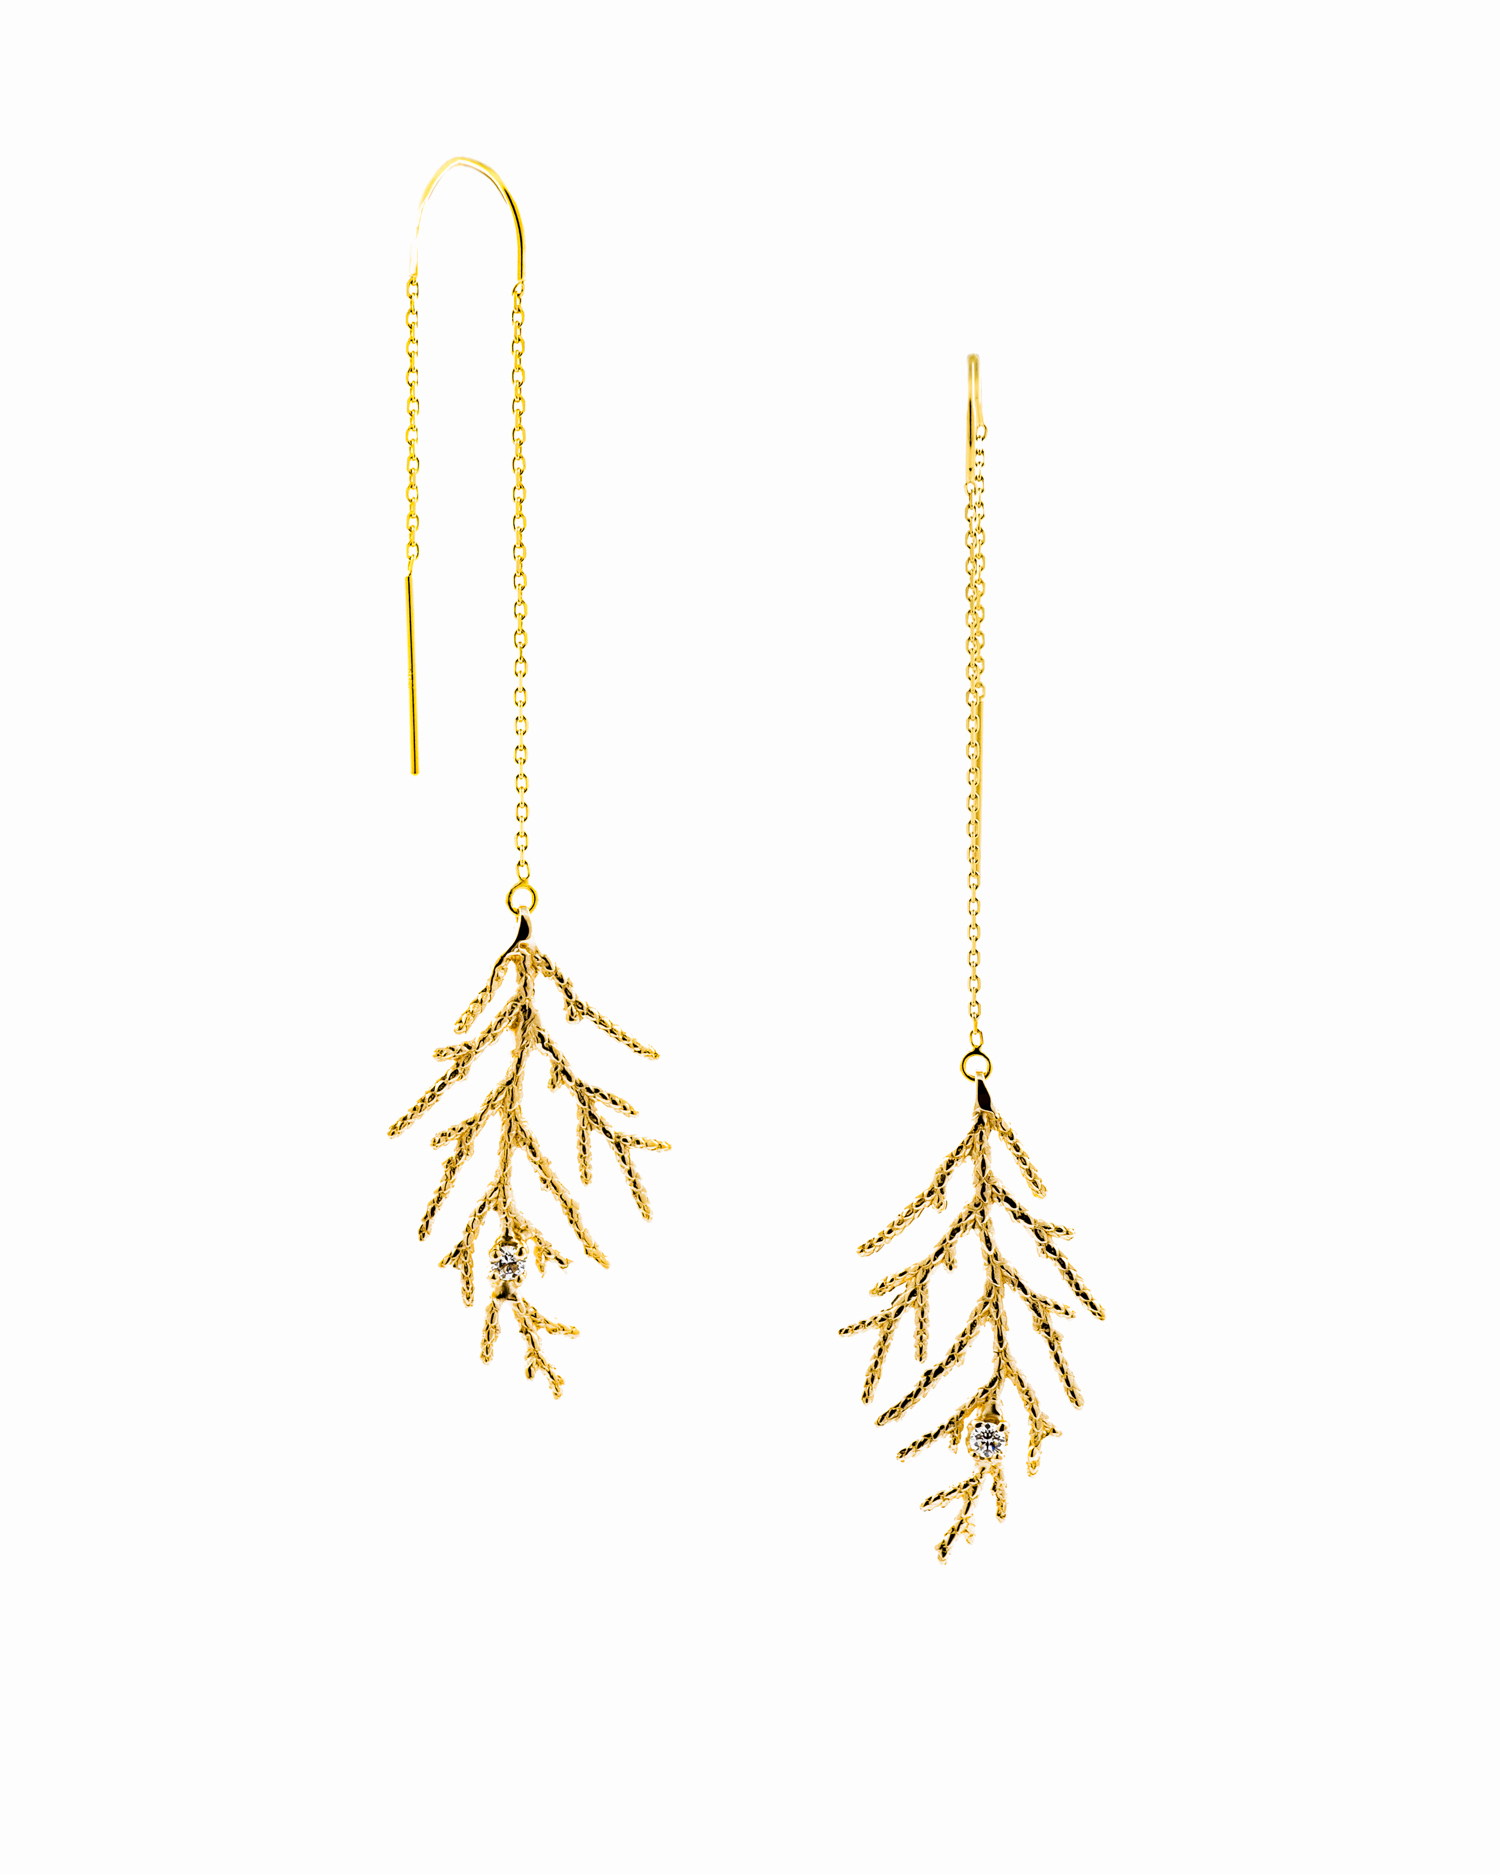 Winter Earrings; Yellow gold, white diamonds.